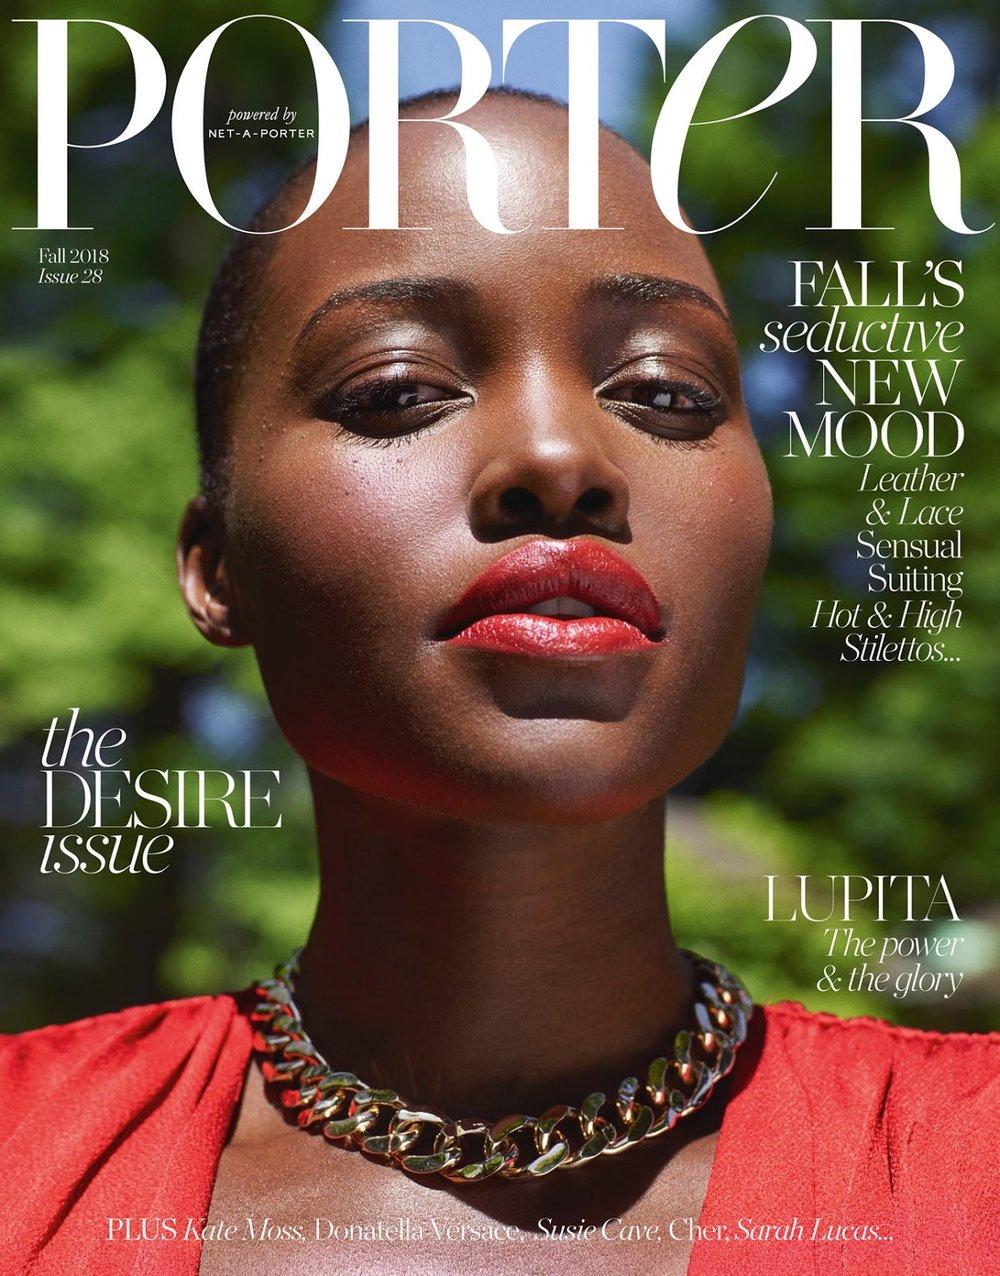 Lupita Nyong'o by Mario Sorrenti for Porter 28 Fall 2018 (15).jpg